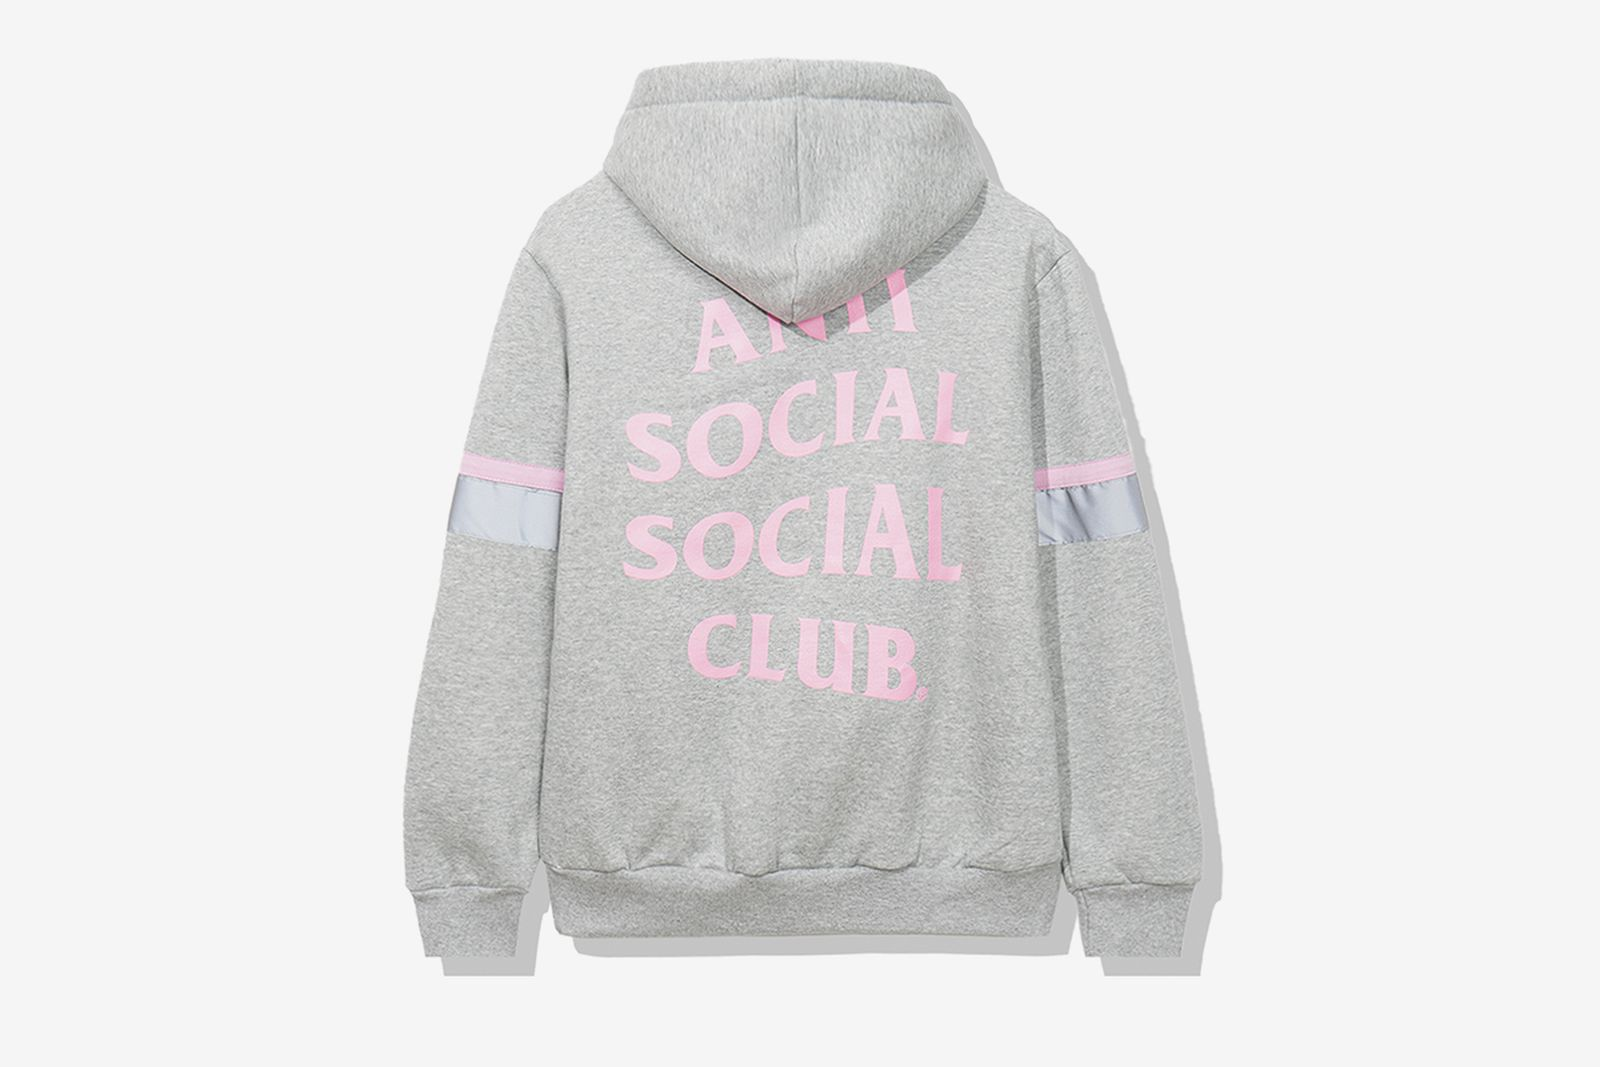 anti-social-social-club-usps-collaboration-2-10